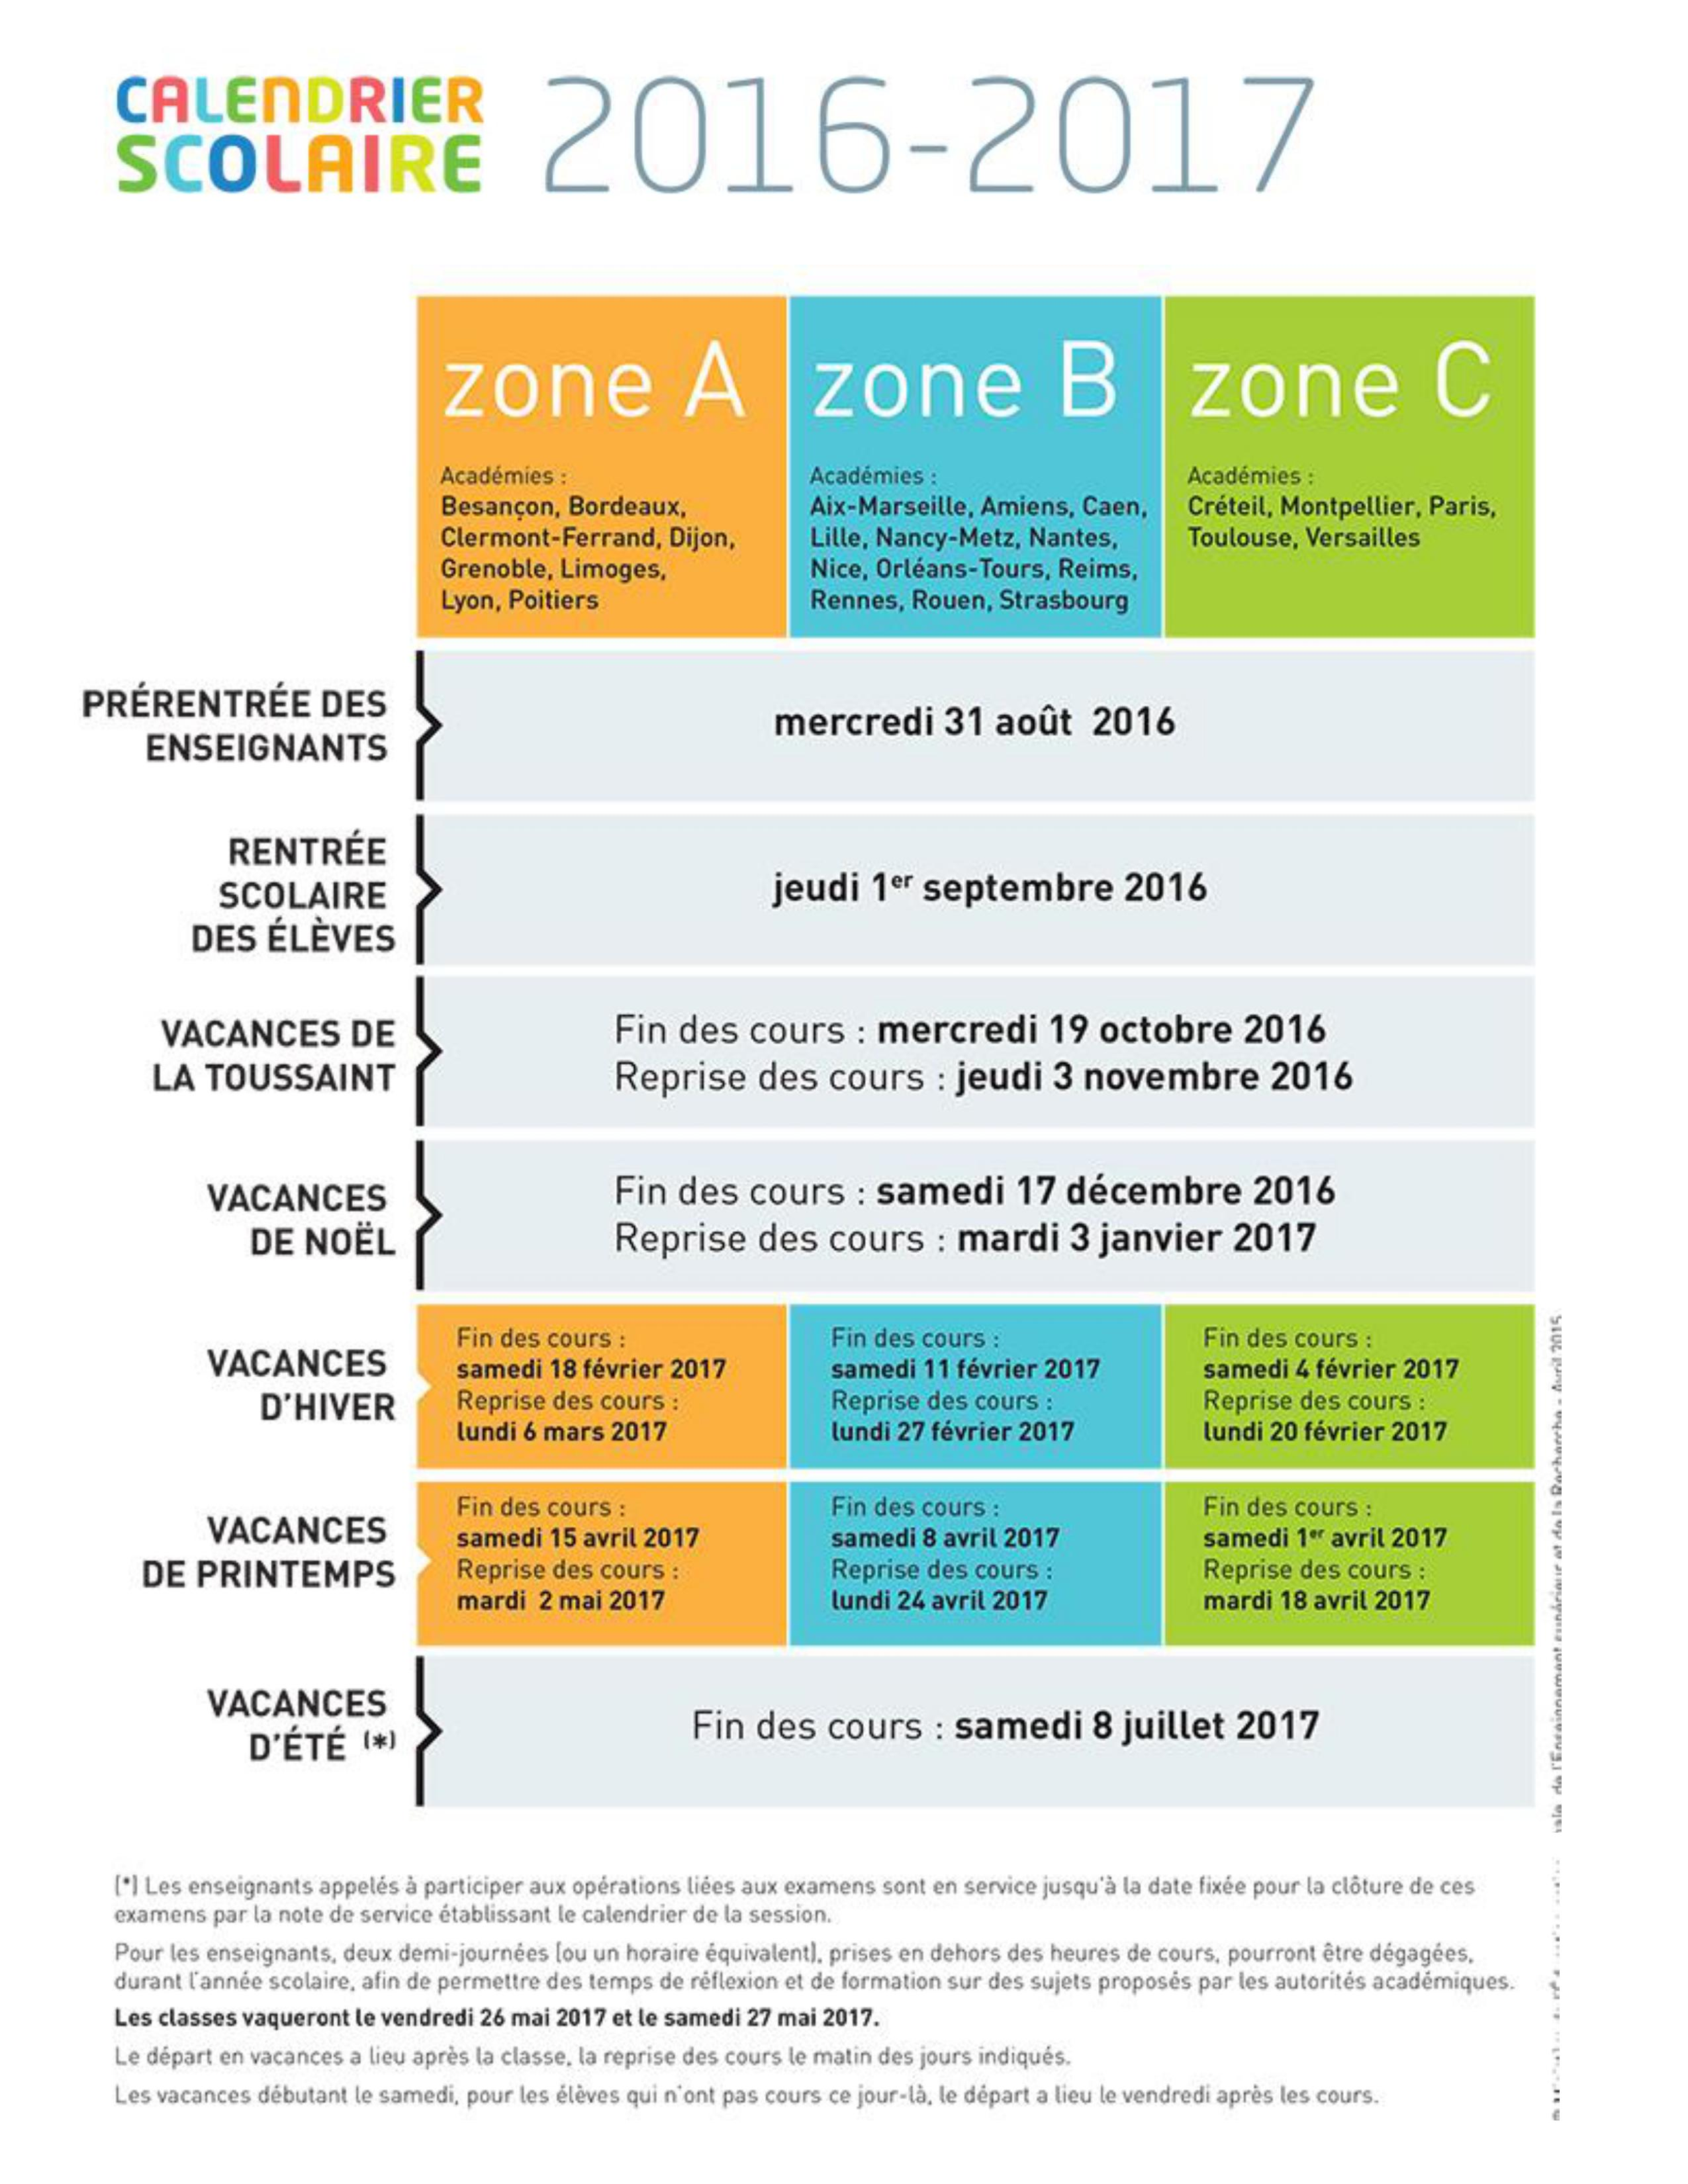 calendrier-scolaire-2016-2017-2